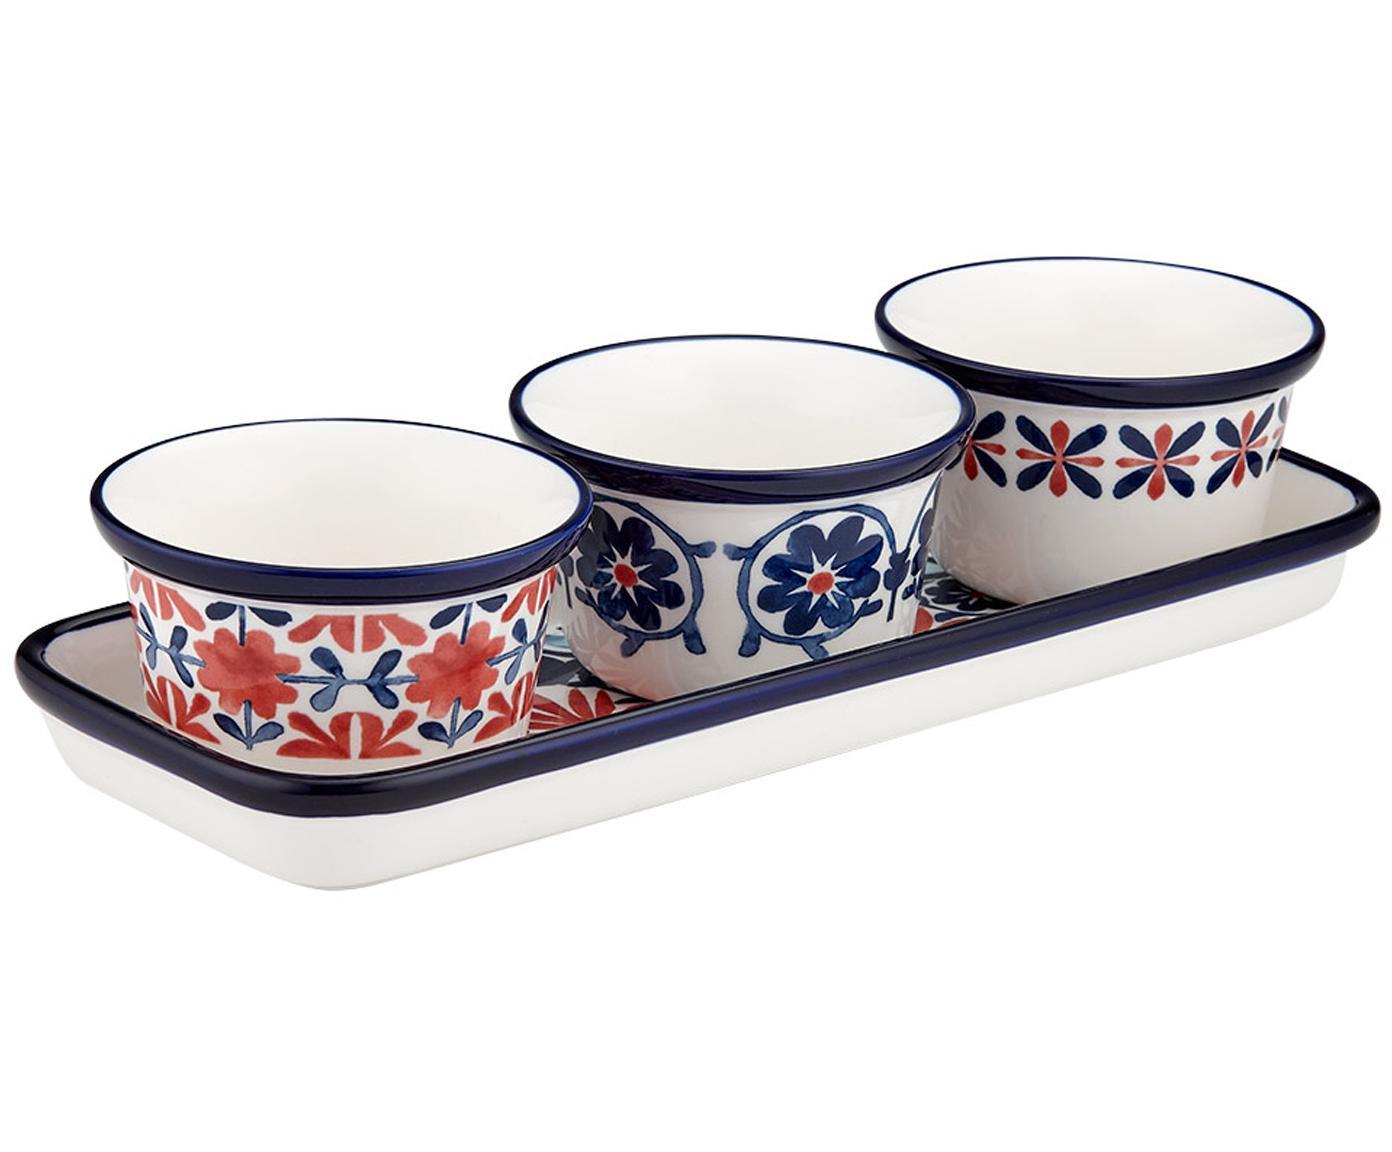 Dipschalen-Set Fiesta, 4-tlg., New Bone China, Rot, Blautöne, Weiss, Ø 10 x H 6 cm